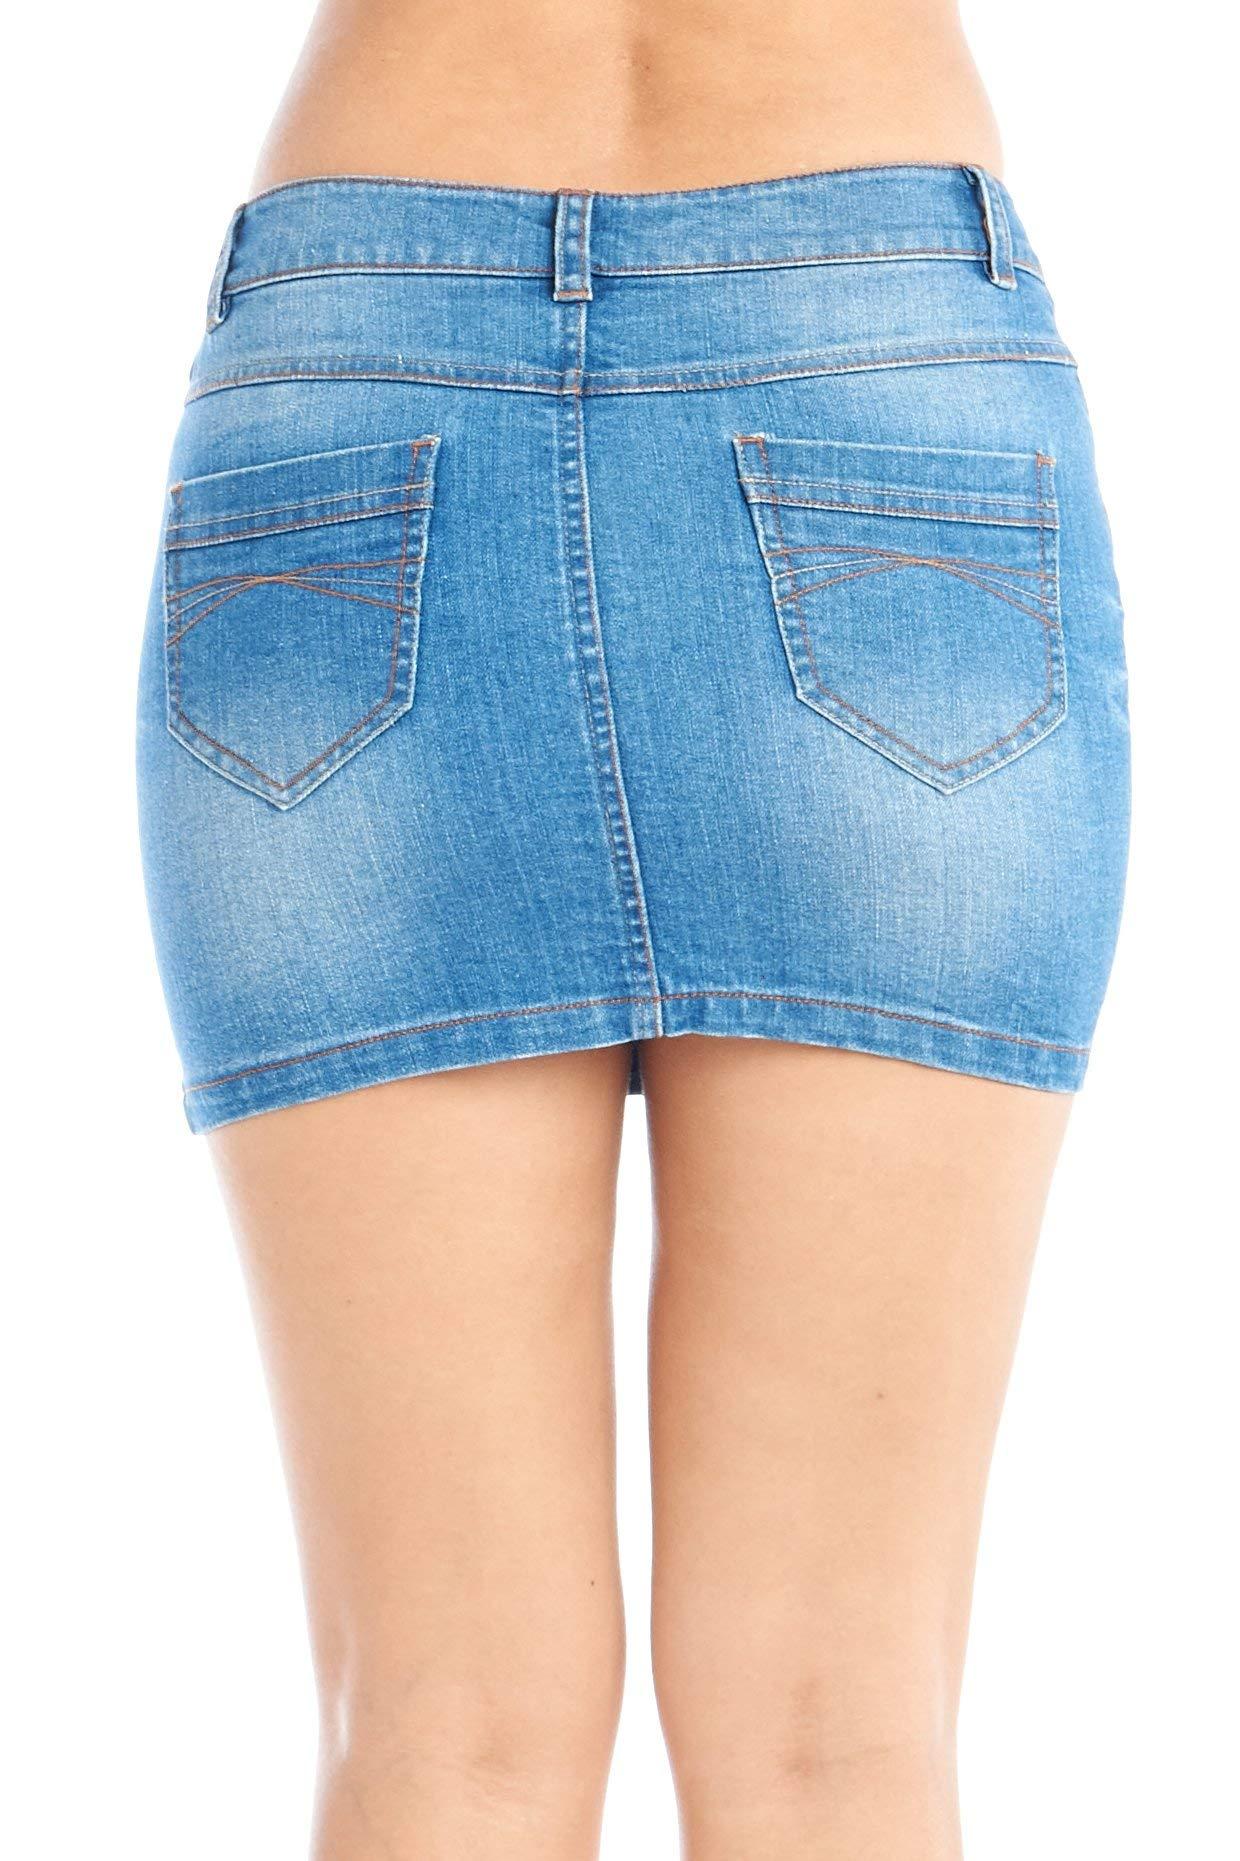 Women's Jeans Denim Mini 5 Pocket Skirts Juniors 4